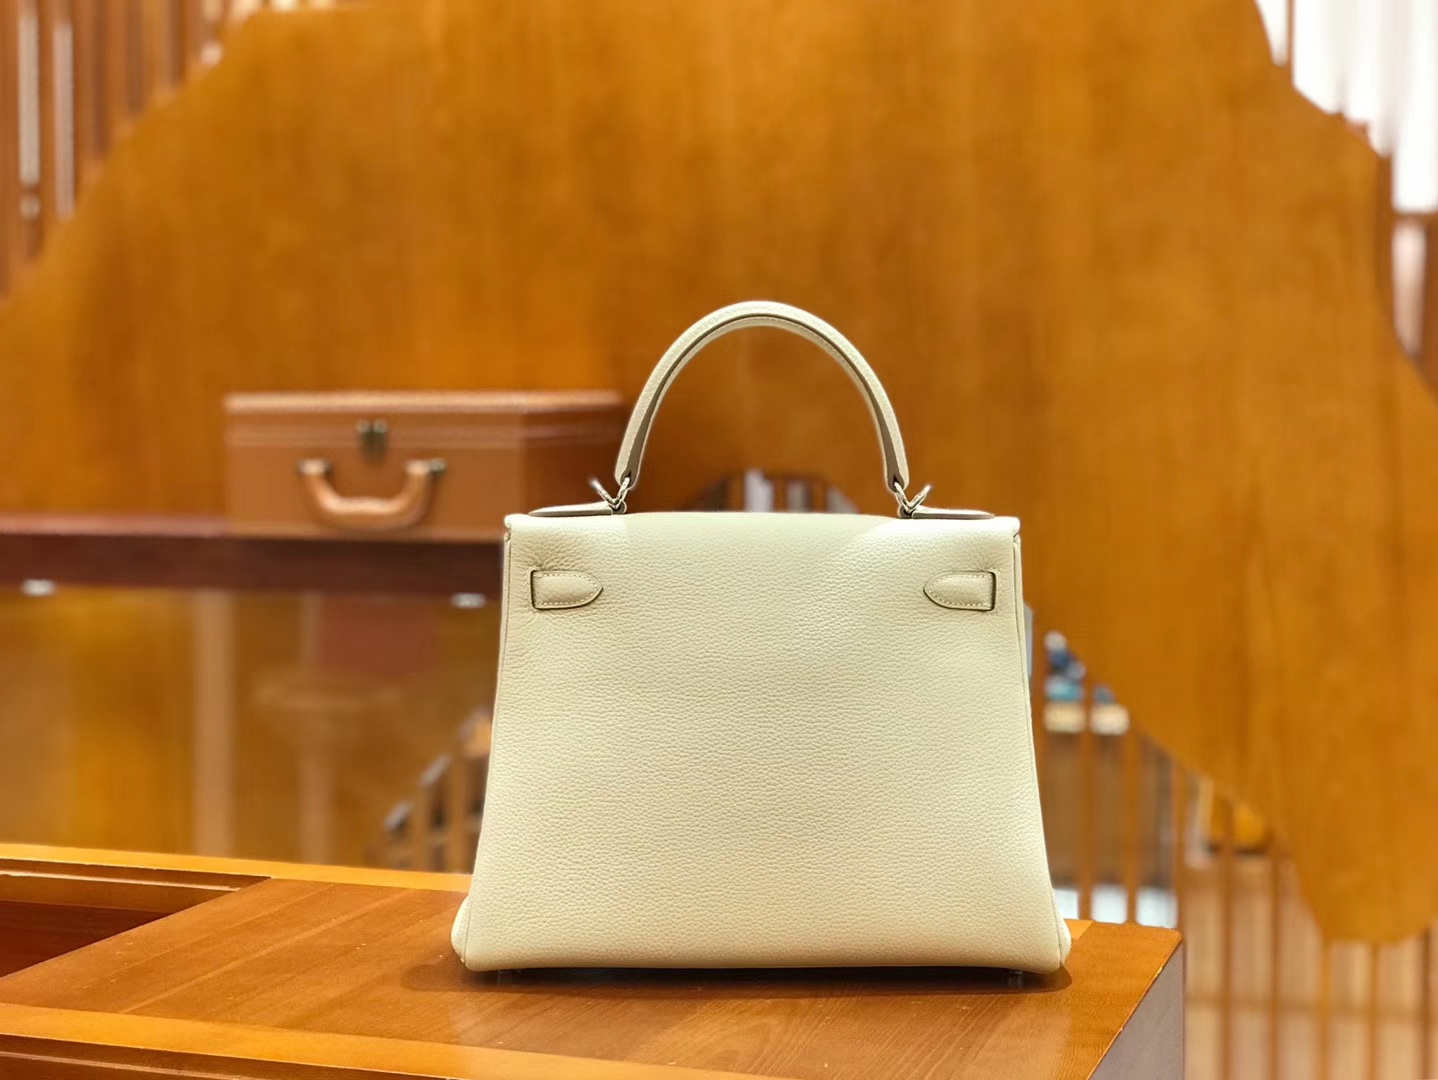 Hermès(爱马仕)Kelly 28cm togo 牛皮 奶昔白 银扣 全手工缝制 现货